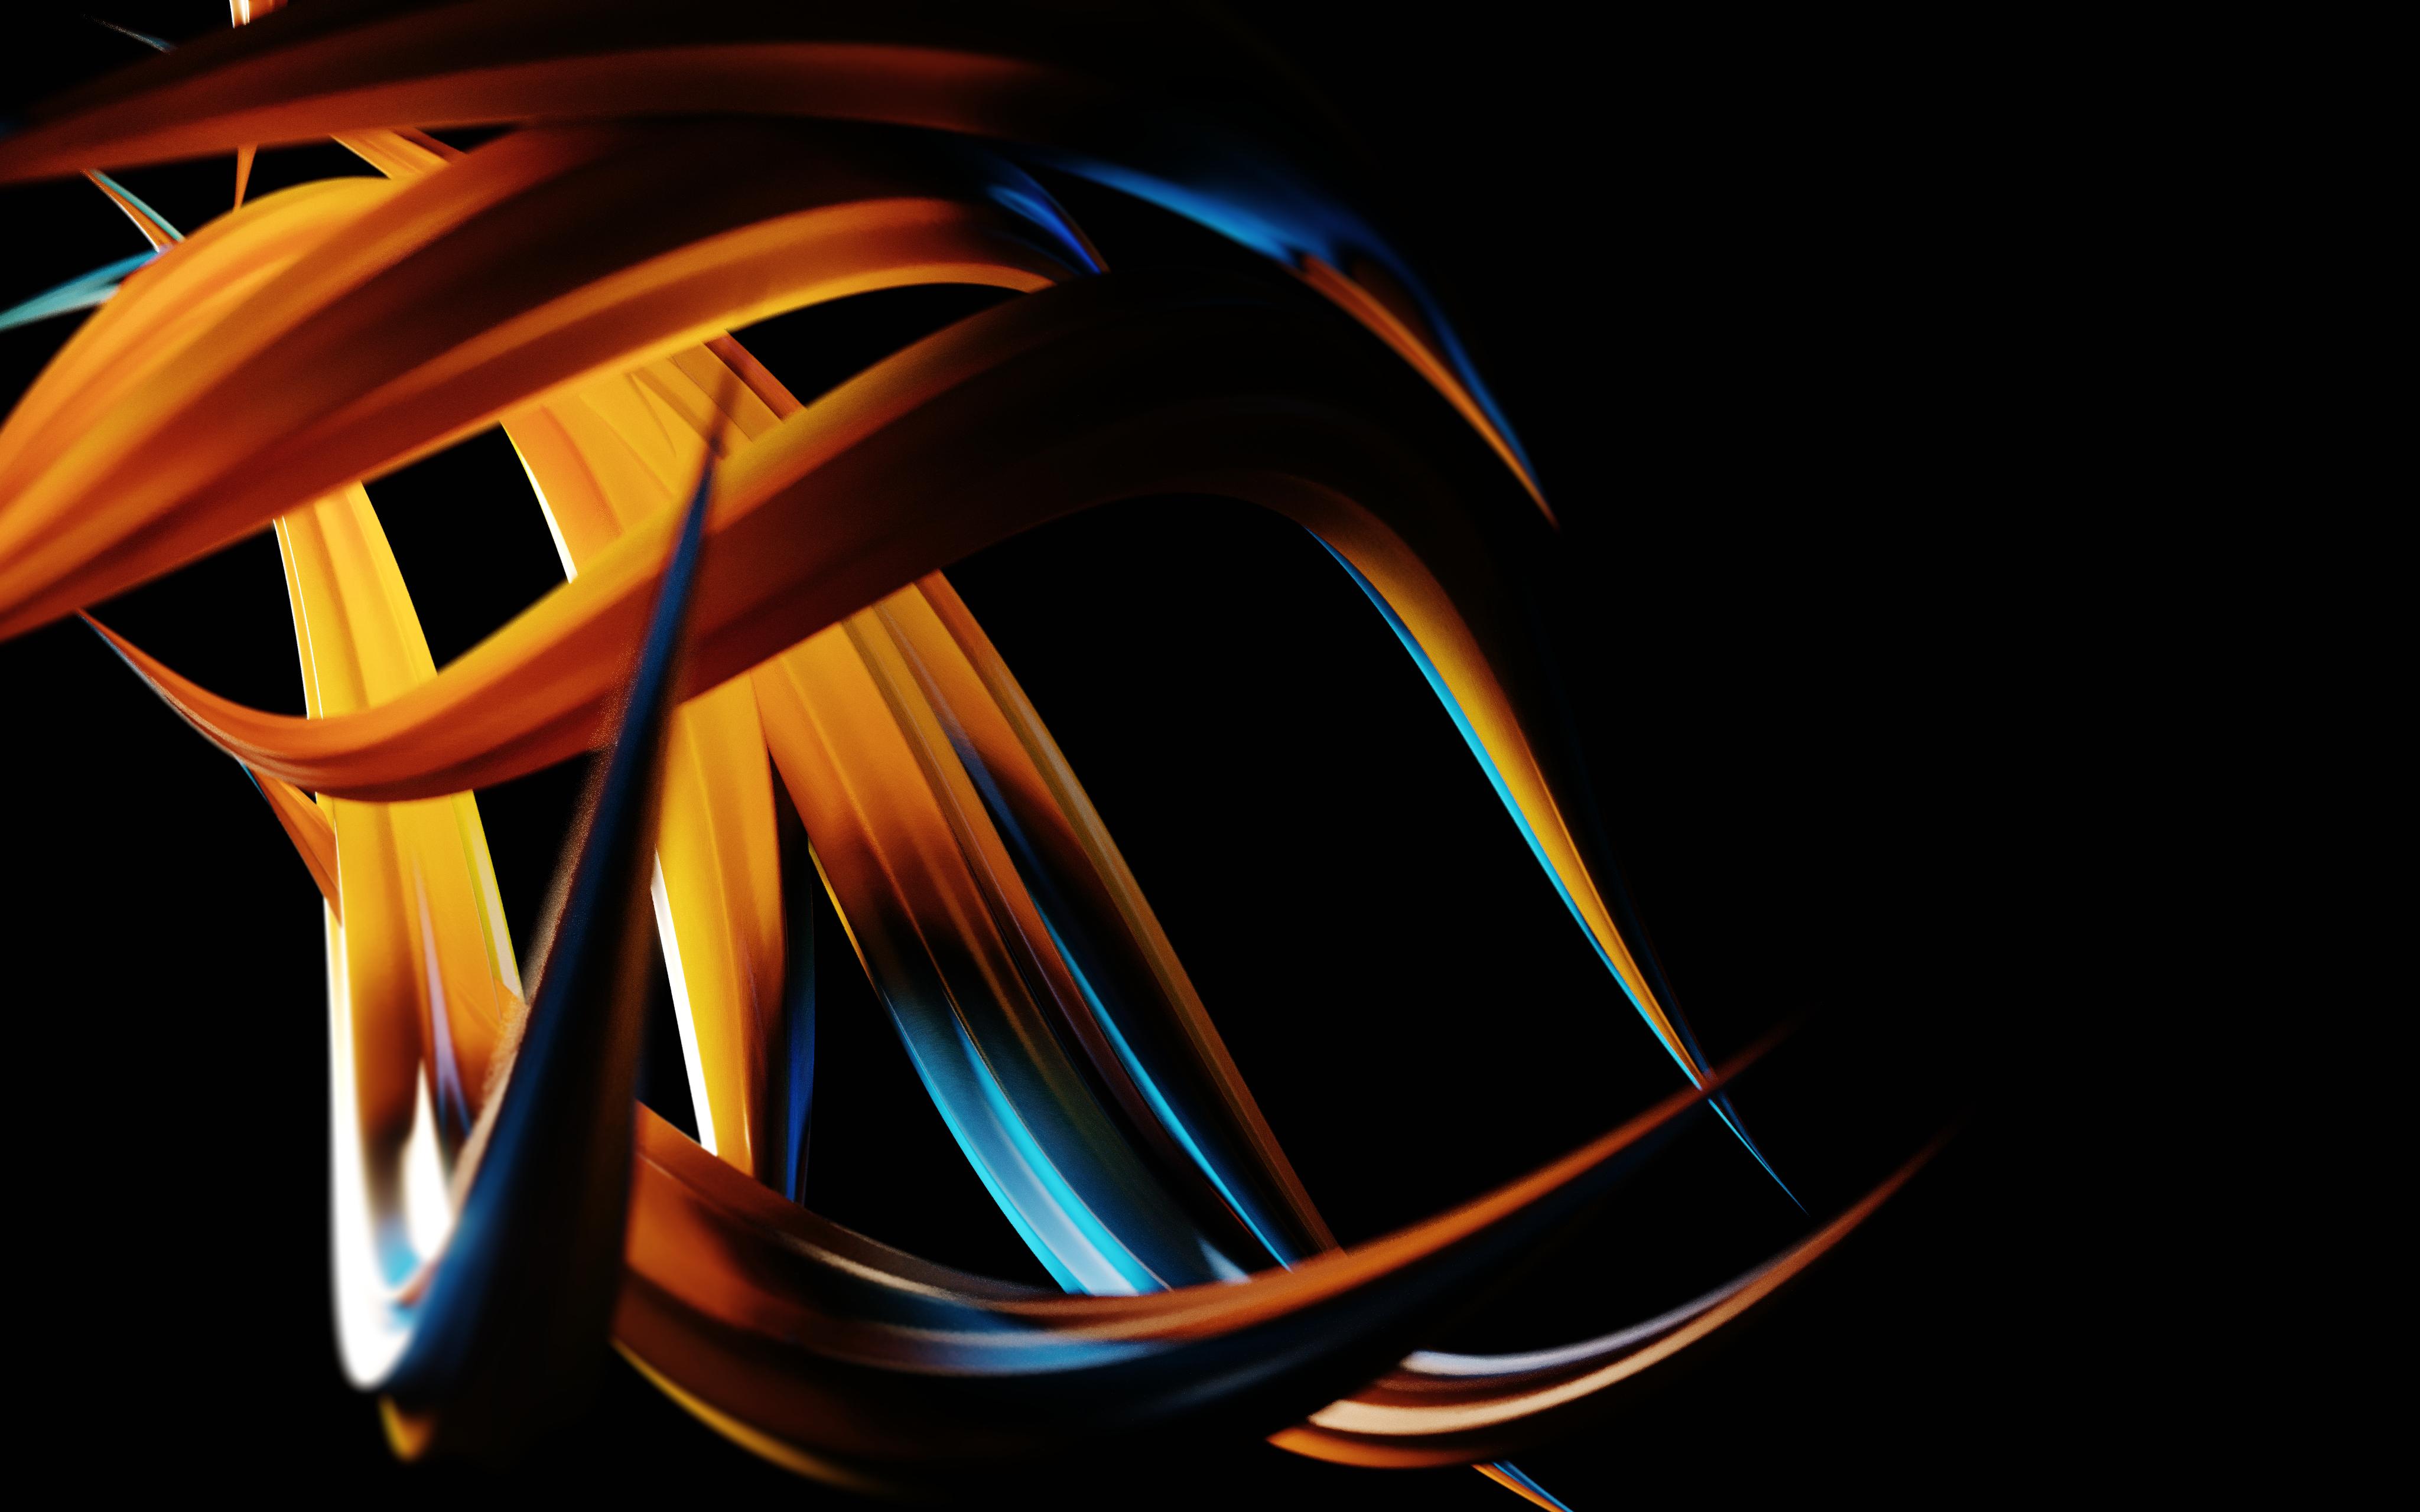 Motion Graphics Orange Light Computer Wallpaper Darkness Line Font Public Domain